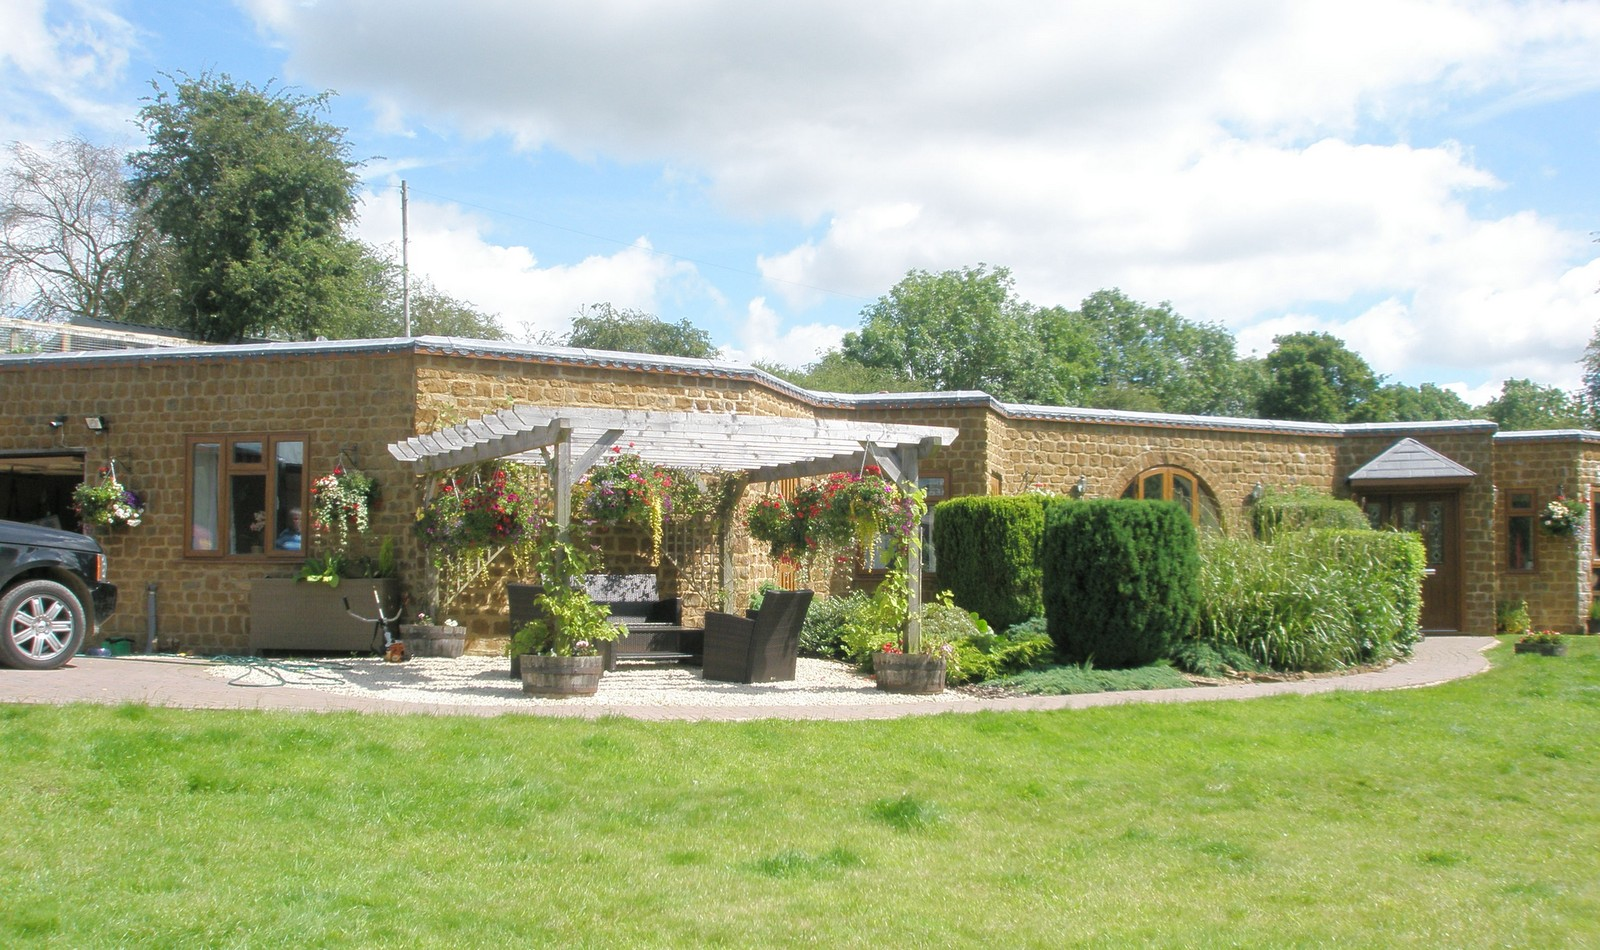 Earth-Sheltered Home near Banbury, Oxon